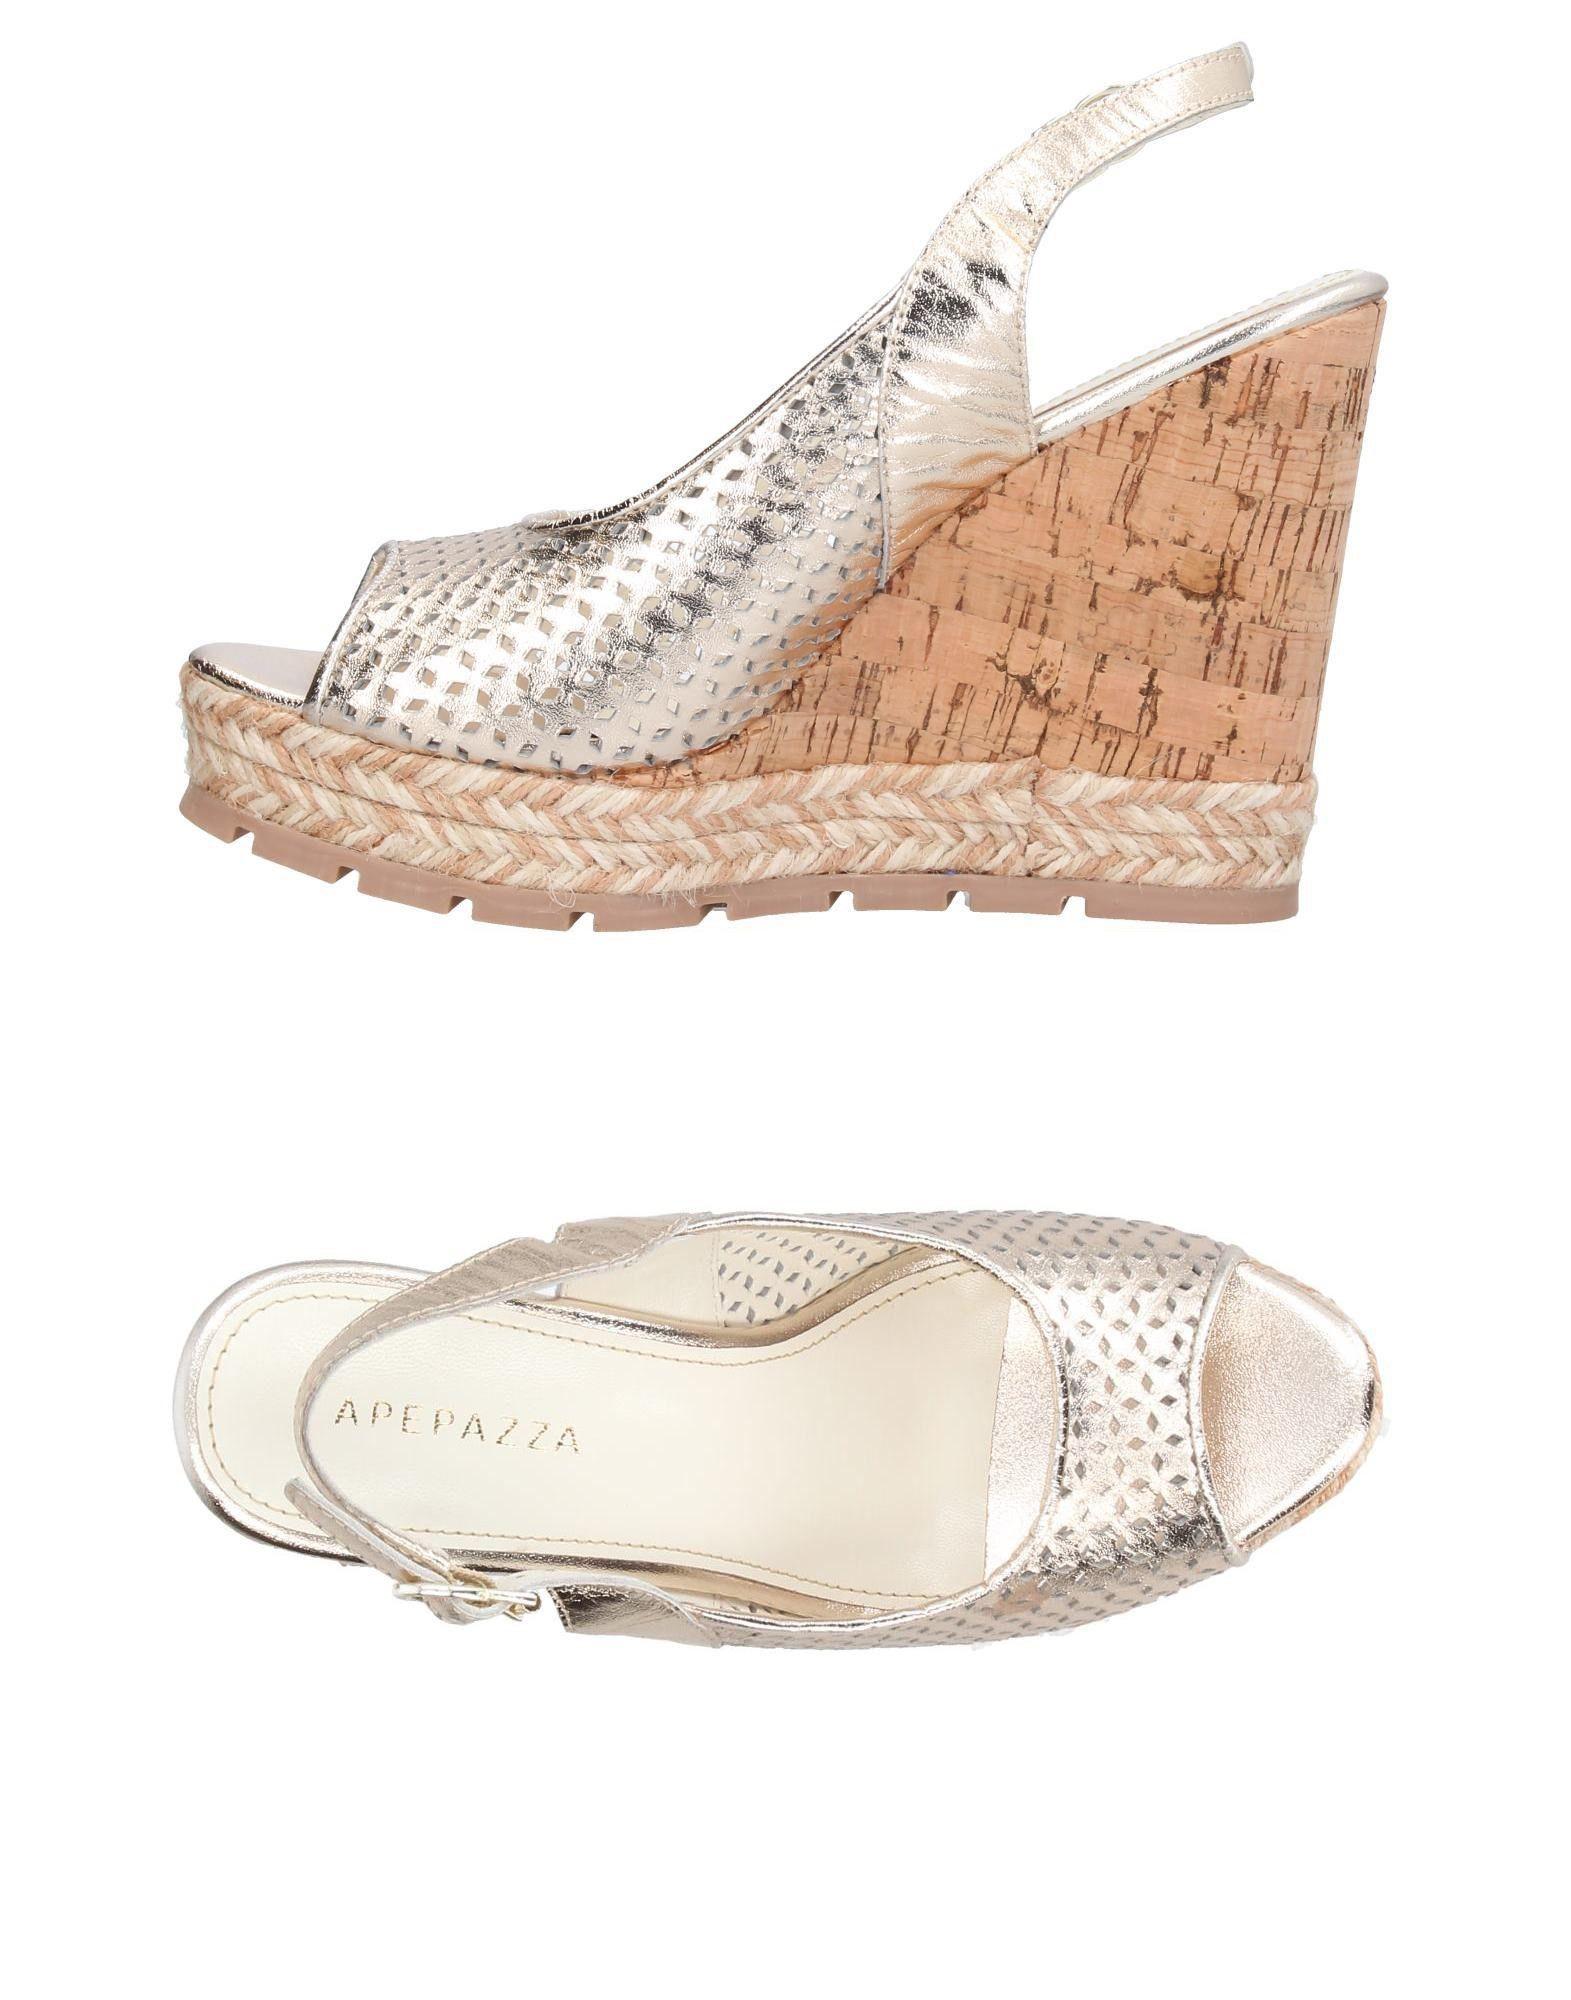 Haltbare Mode billige Schuhe Apepazza Sandalen Damen  11391906XS Heiße Schuhe